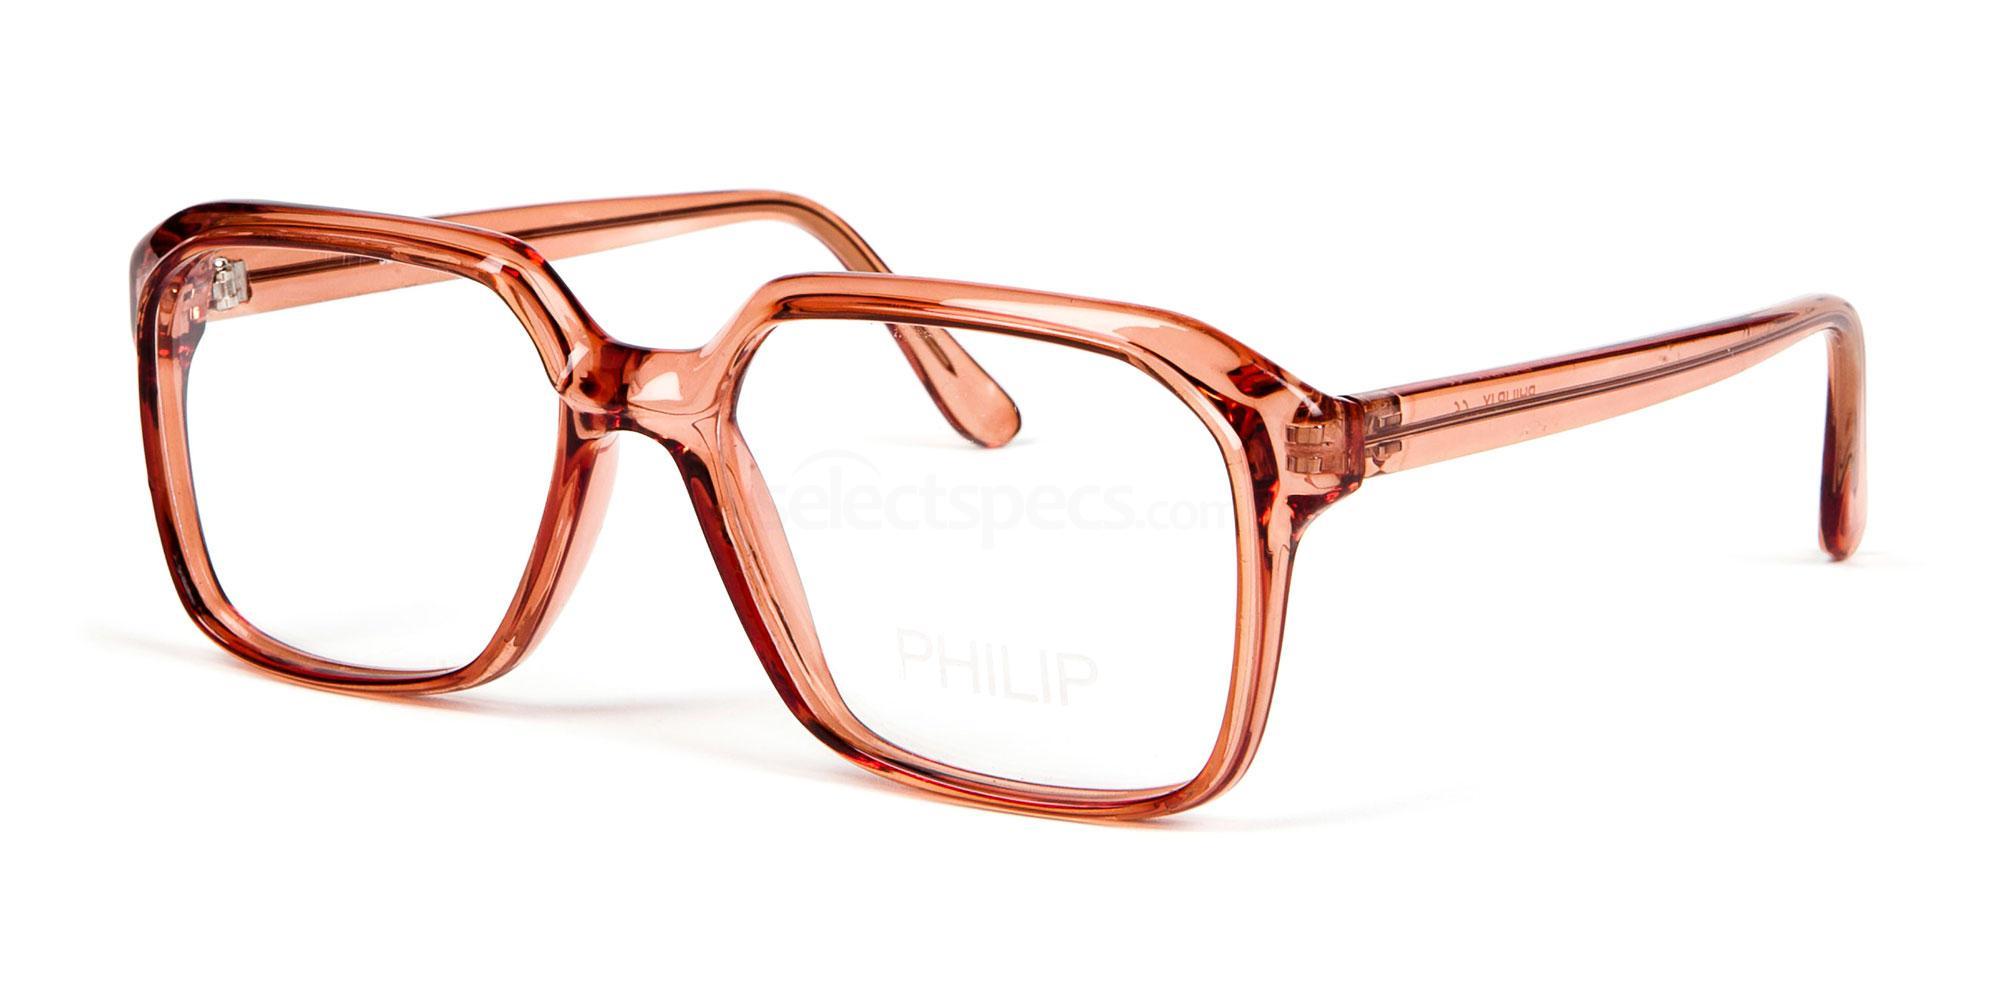 Sherry brown PHILLIP PHILIP IX Glasses, Phillip